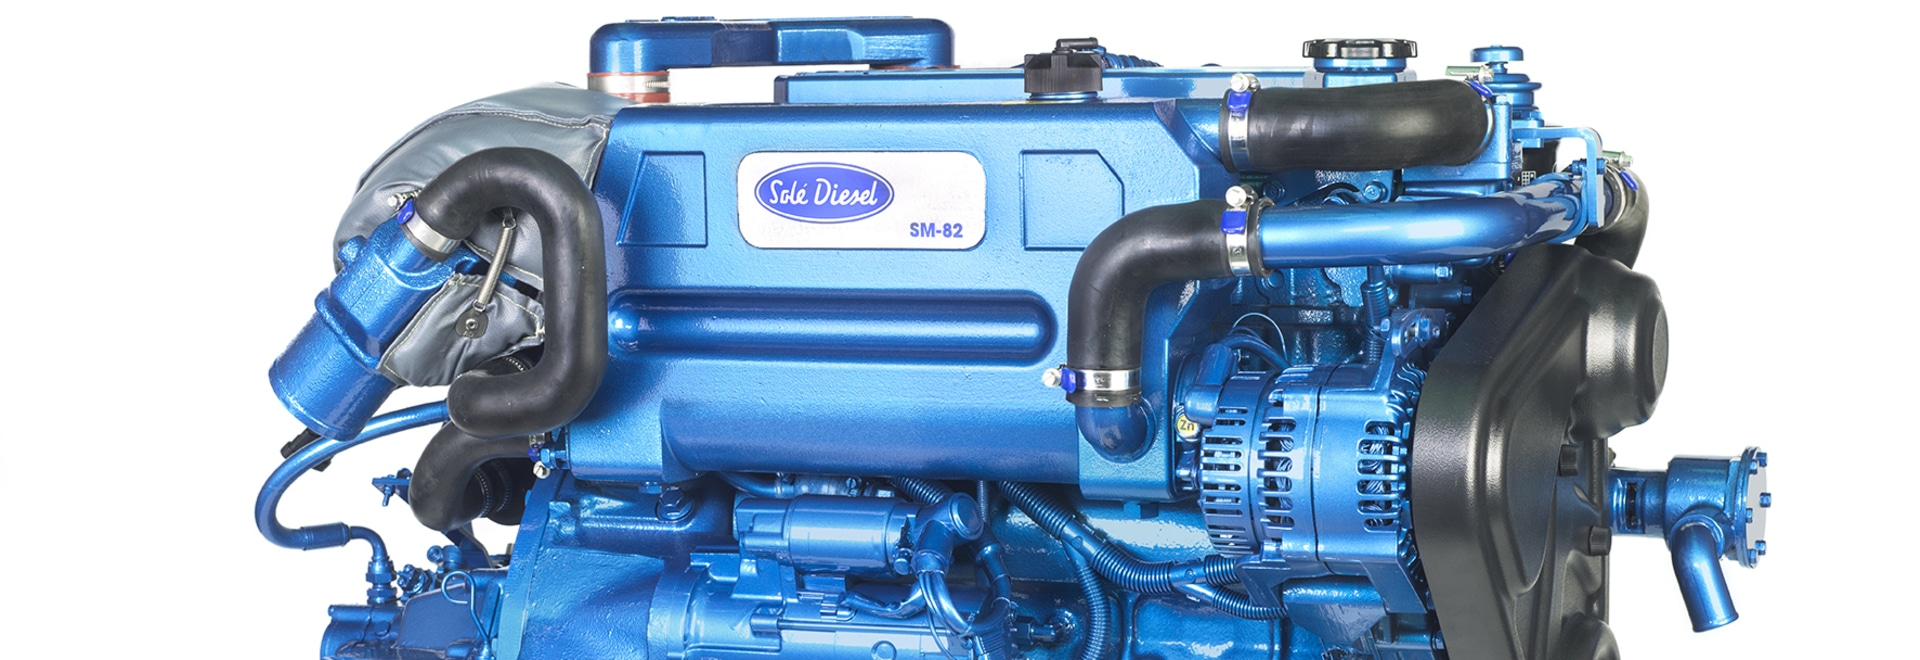 Modèle SM-82